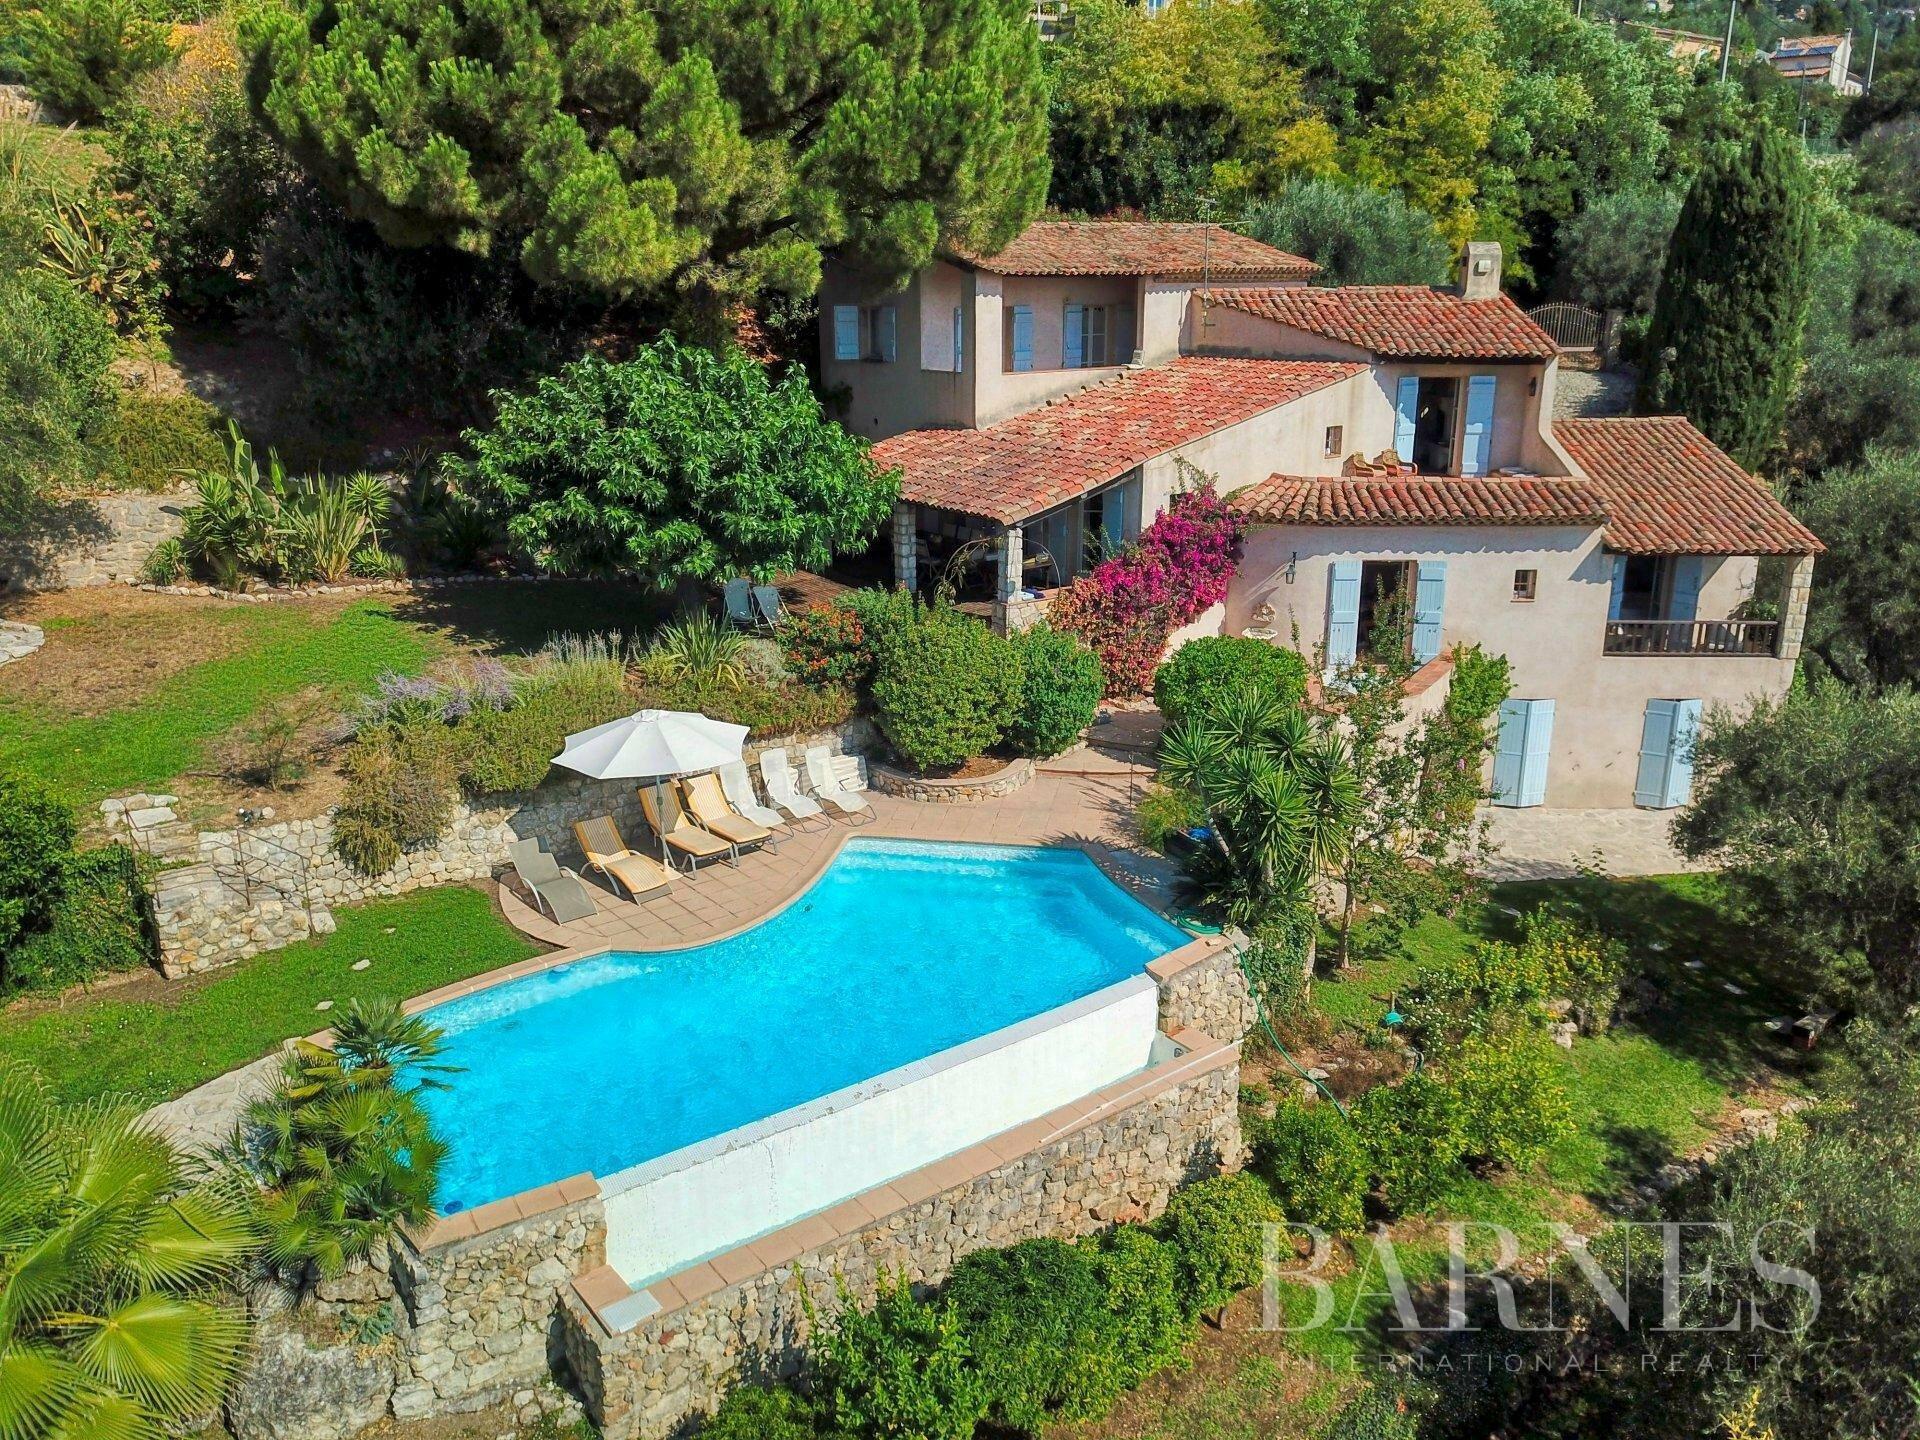 Villa in Grasse, Provence-Alpes-Côte d'Azur, France 1 - 10872800